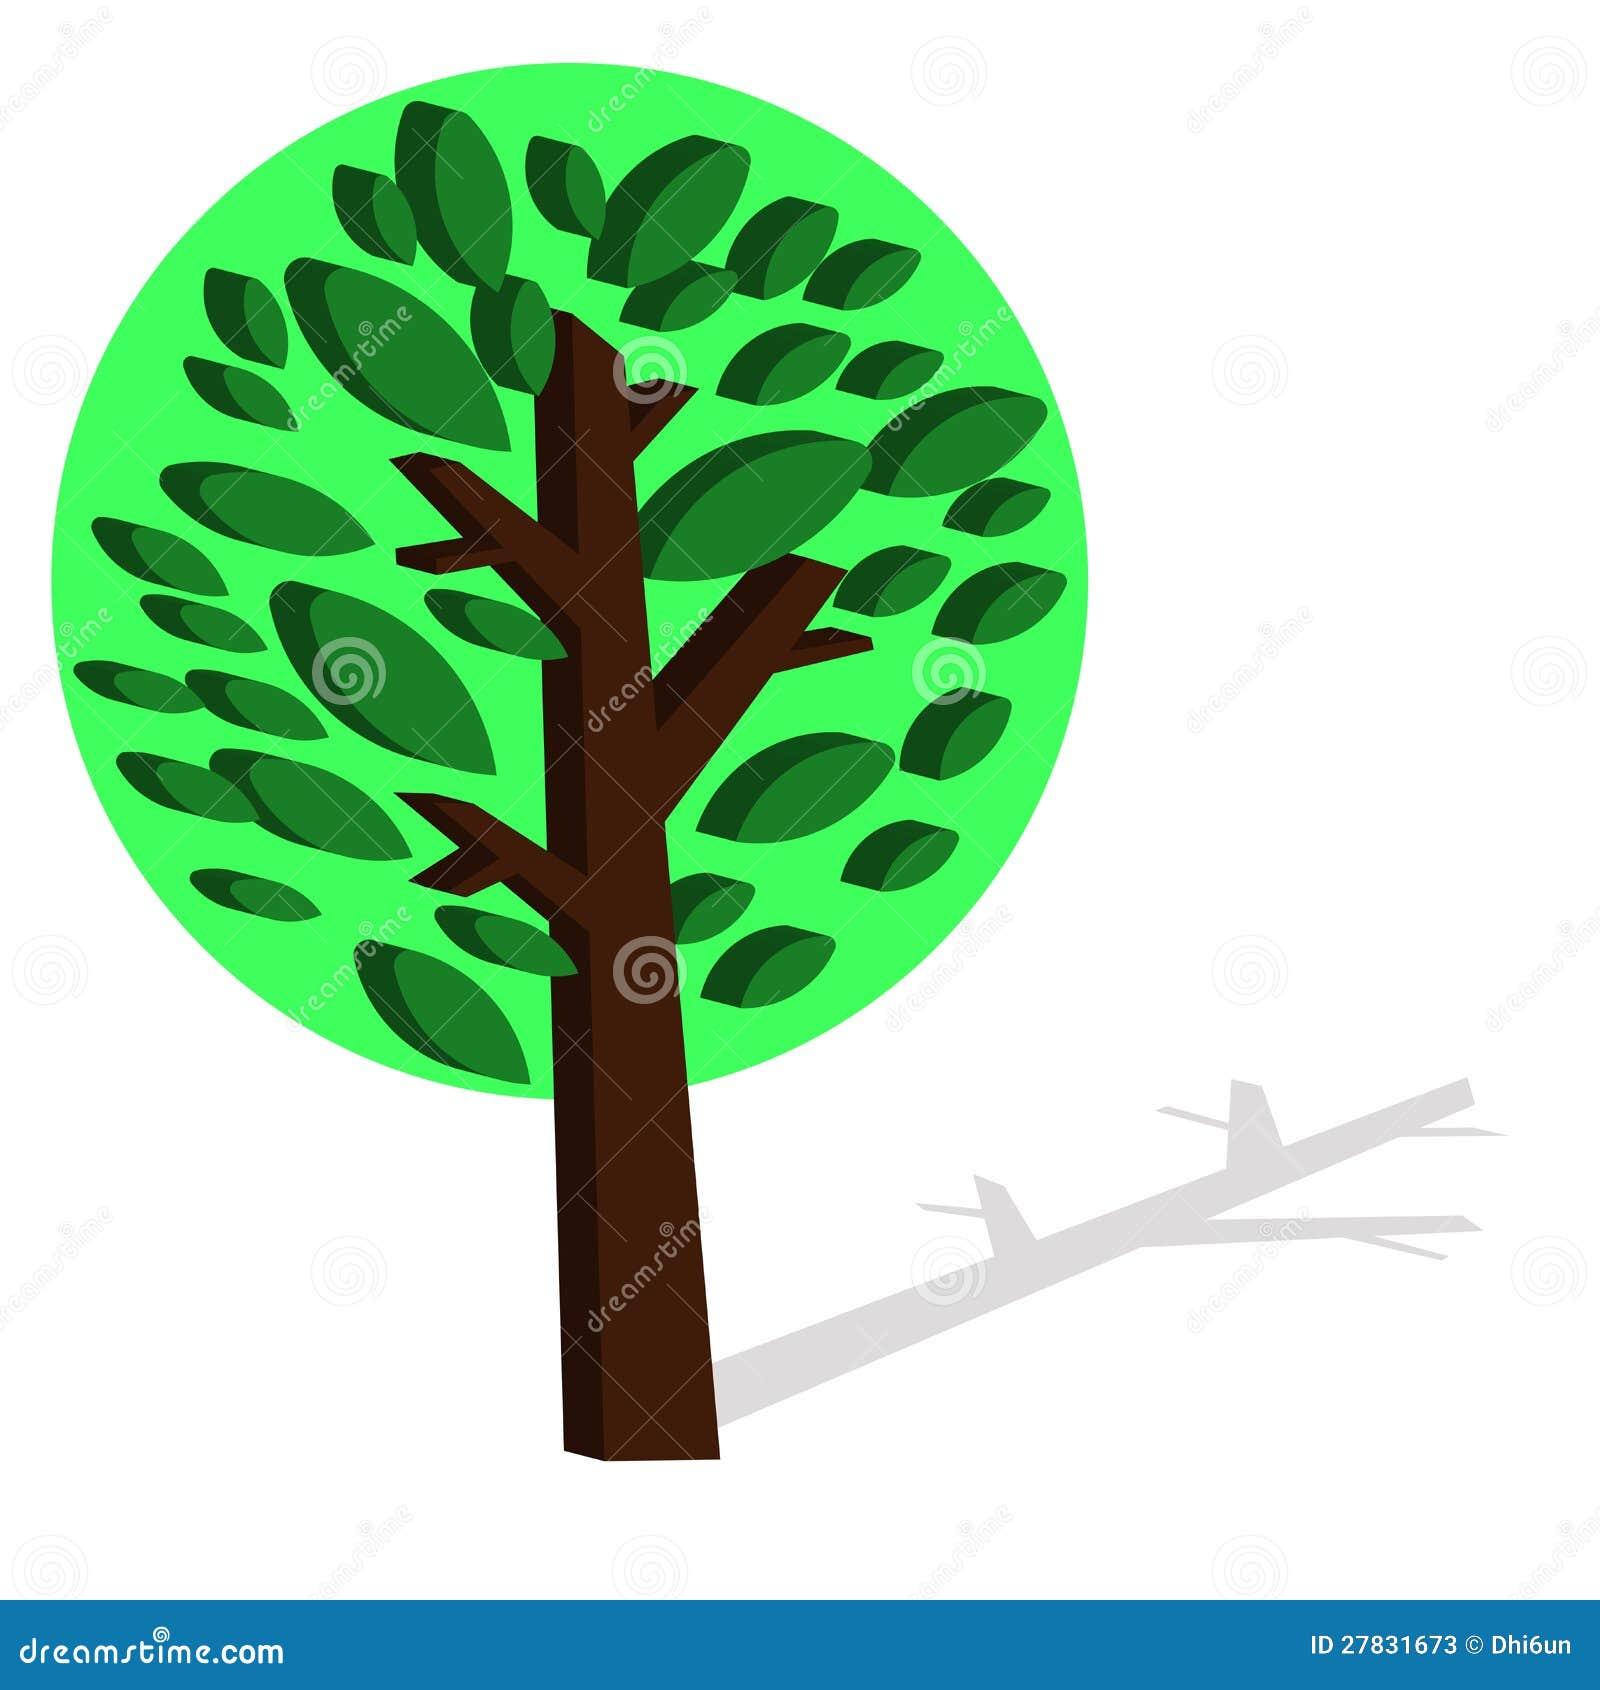 plantes vertes de dessin anim photos stock image 27831673. Black Bedroom Furniture Sets. Home Design Ideas